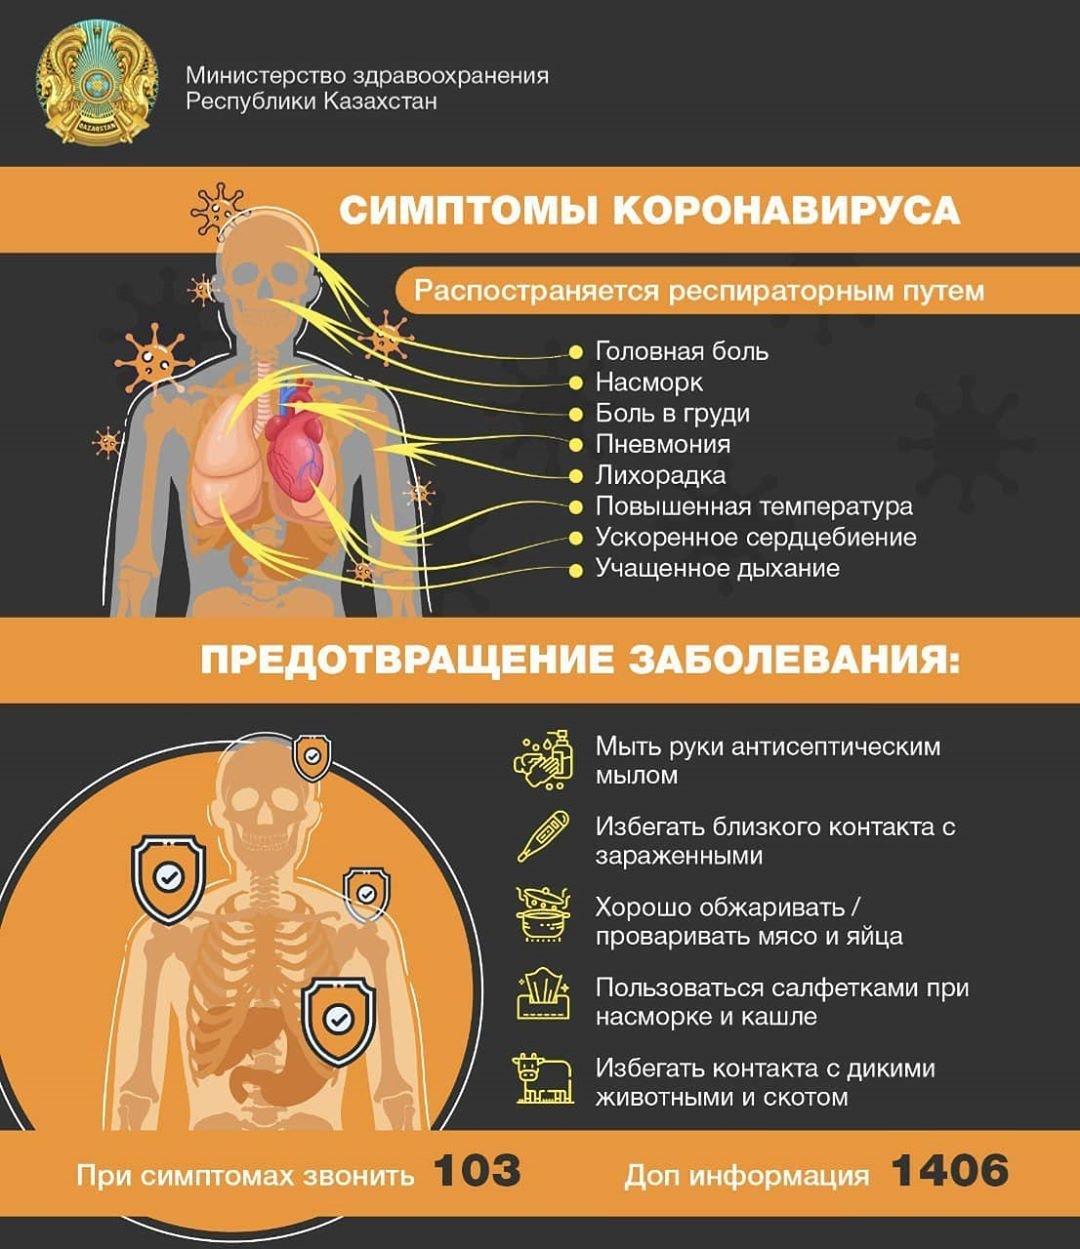 Как обезопасить себя от коронавируса, фото-1